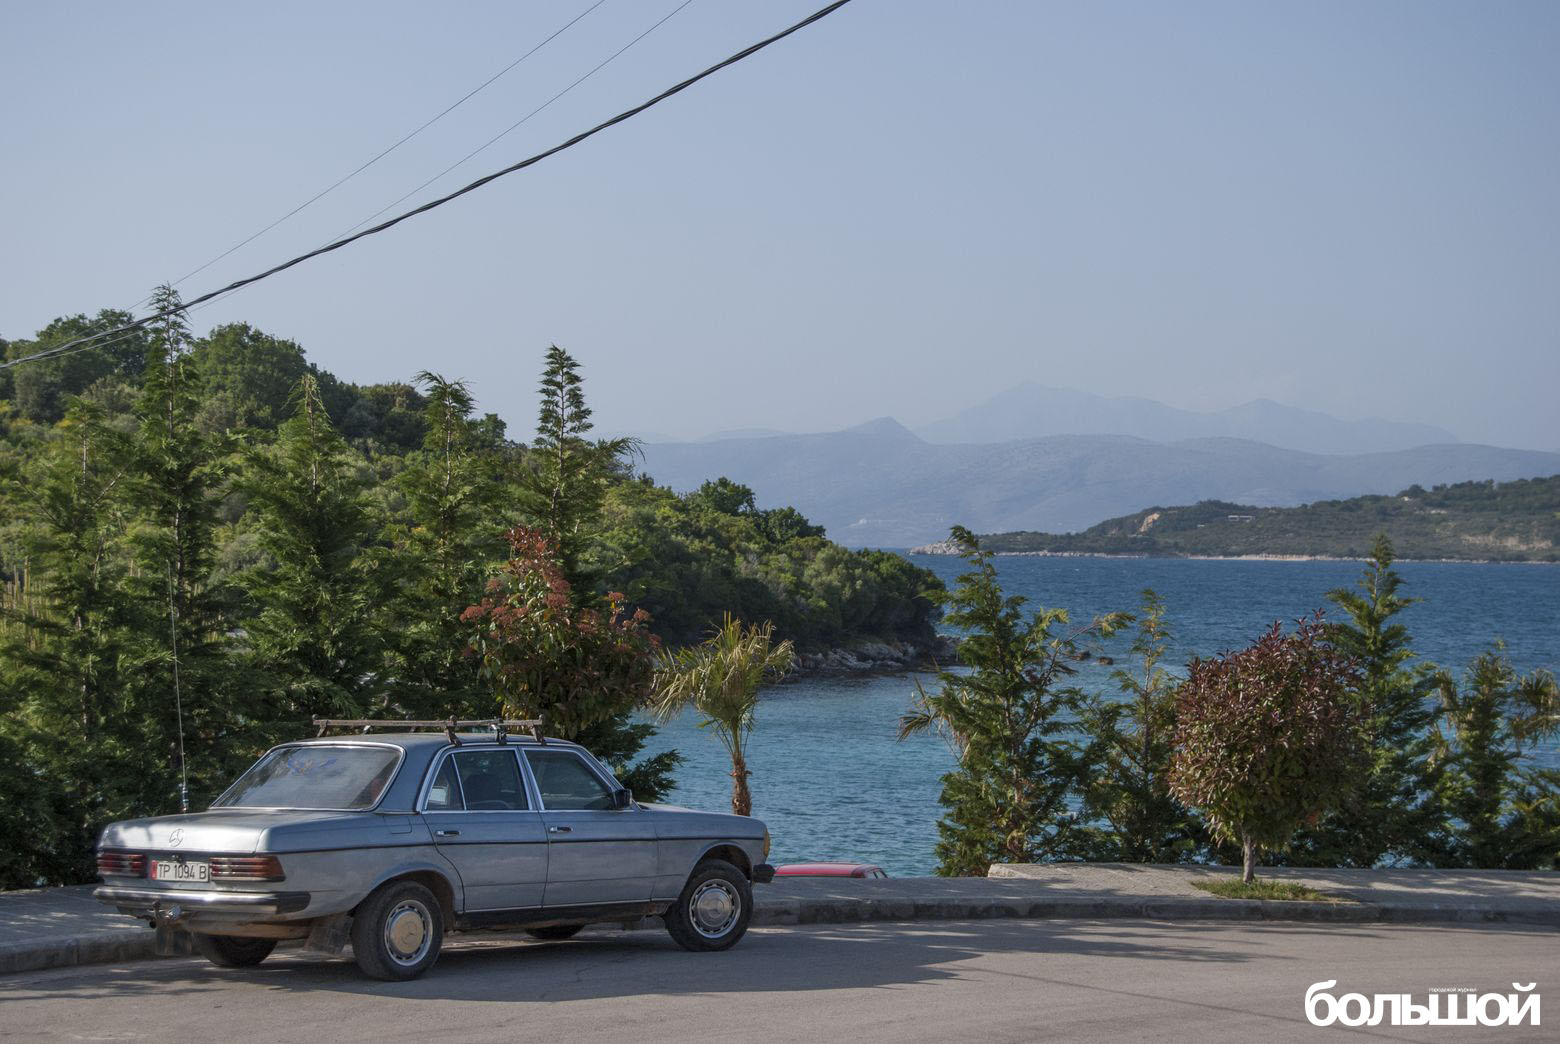 Мерседес на фоне лазурного моря